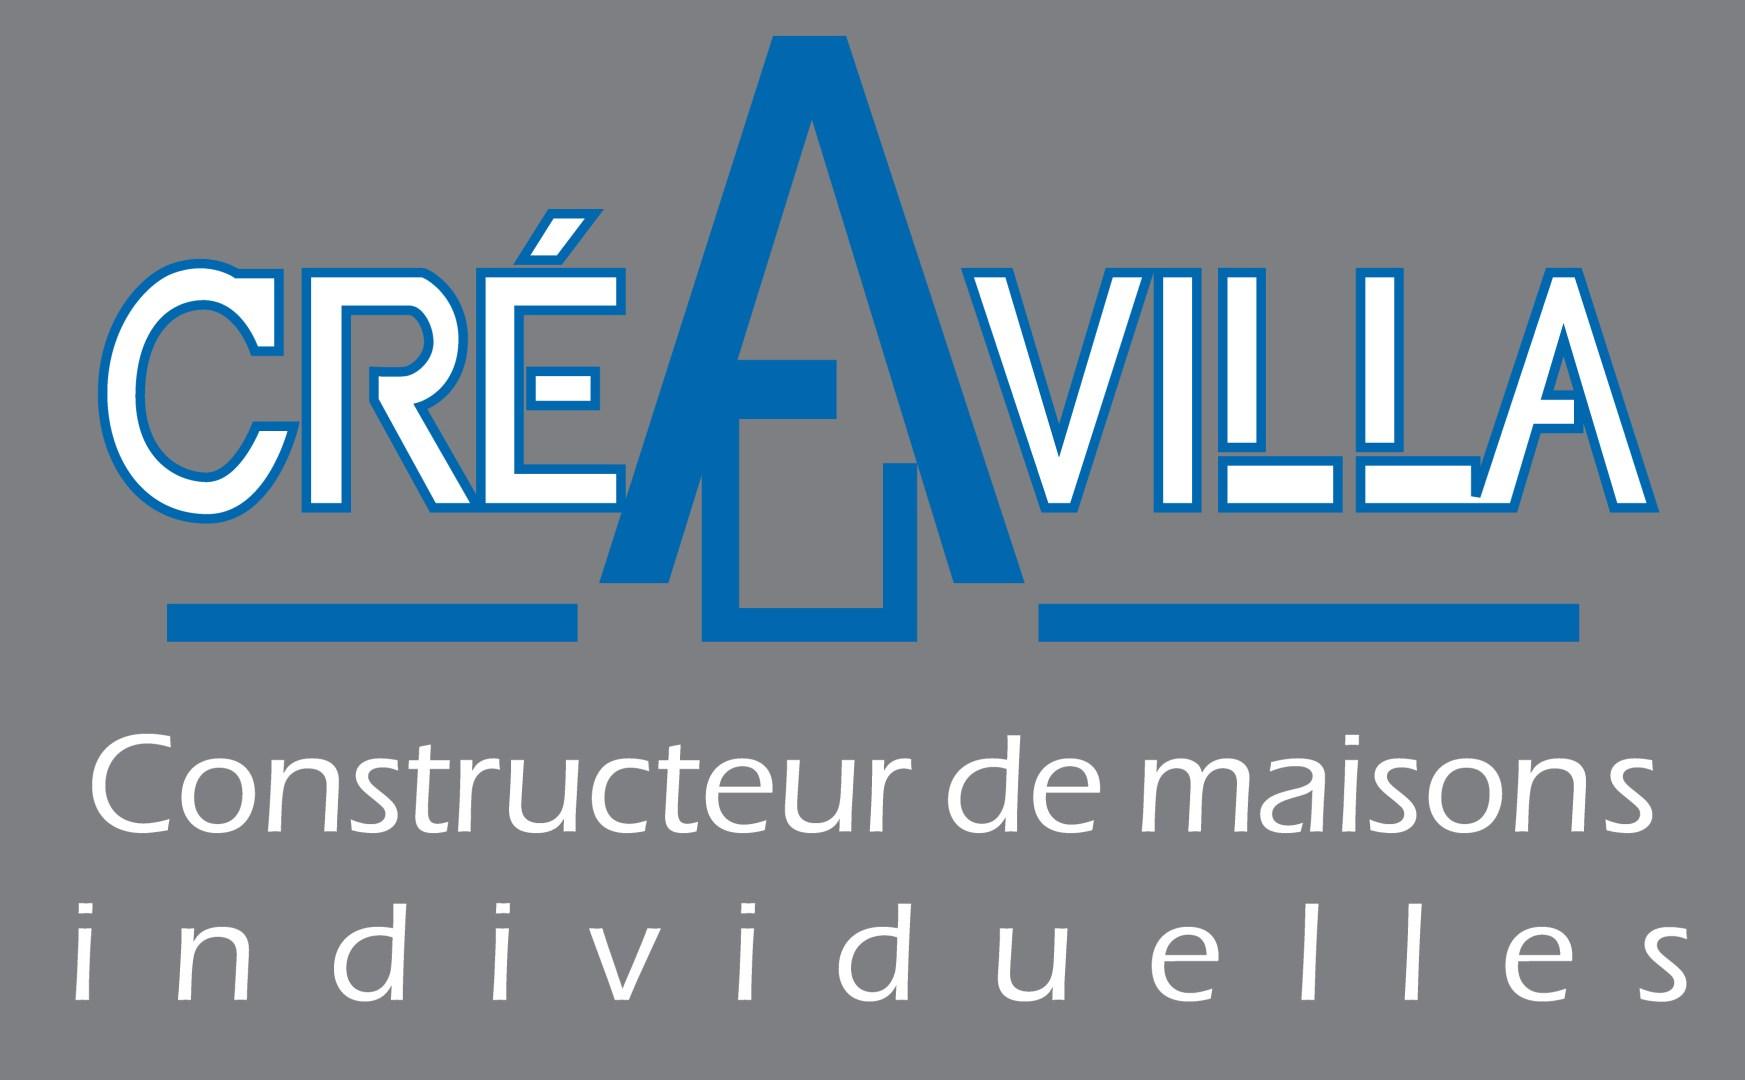 CREAVILLA 73